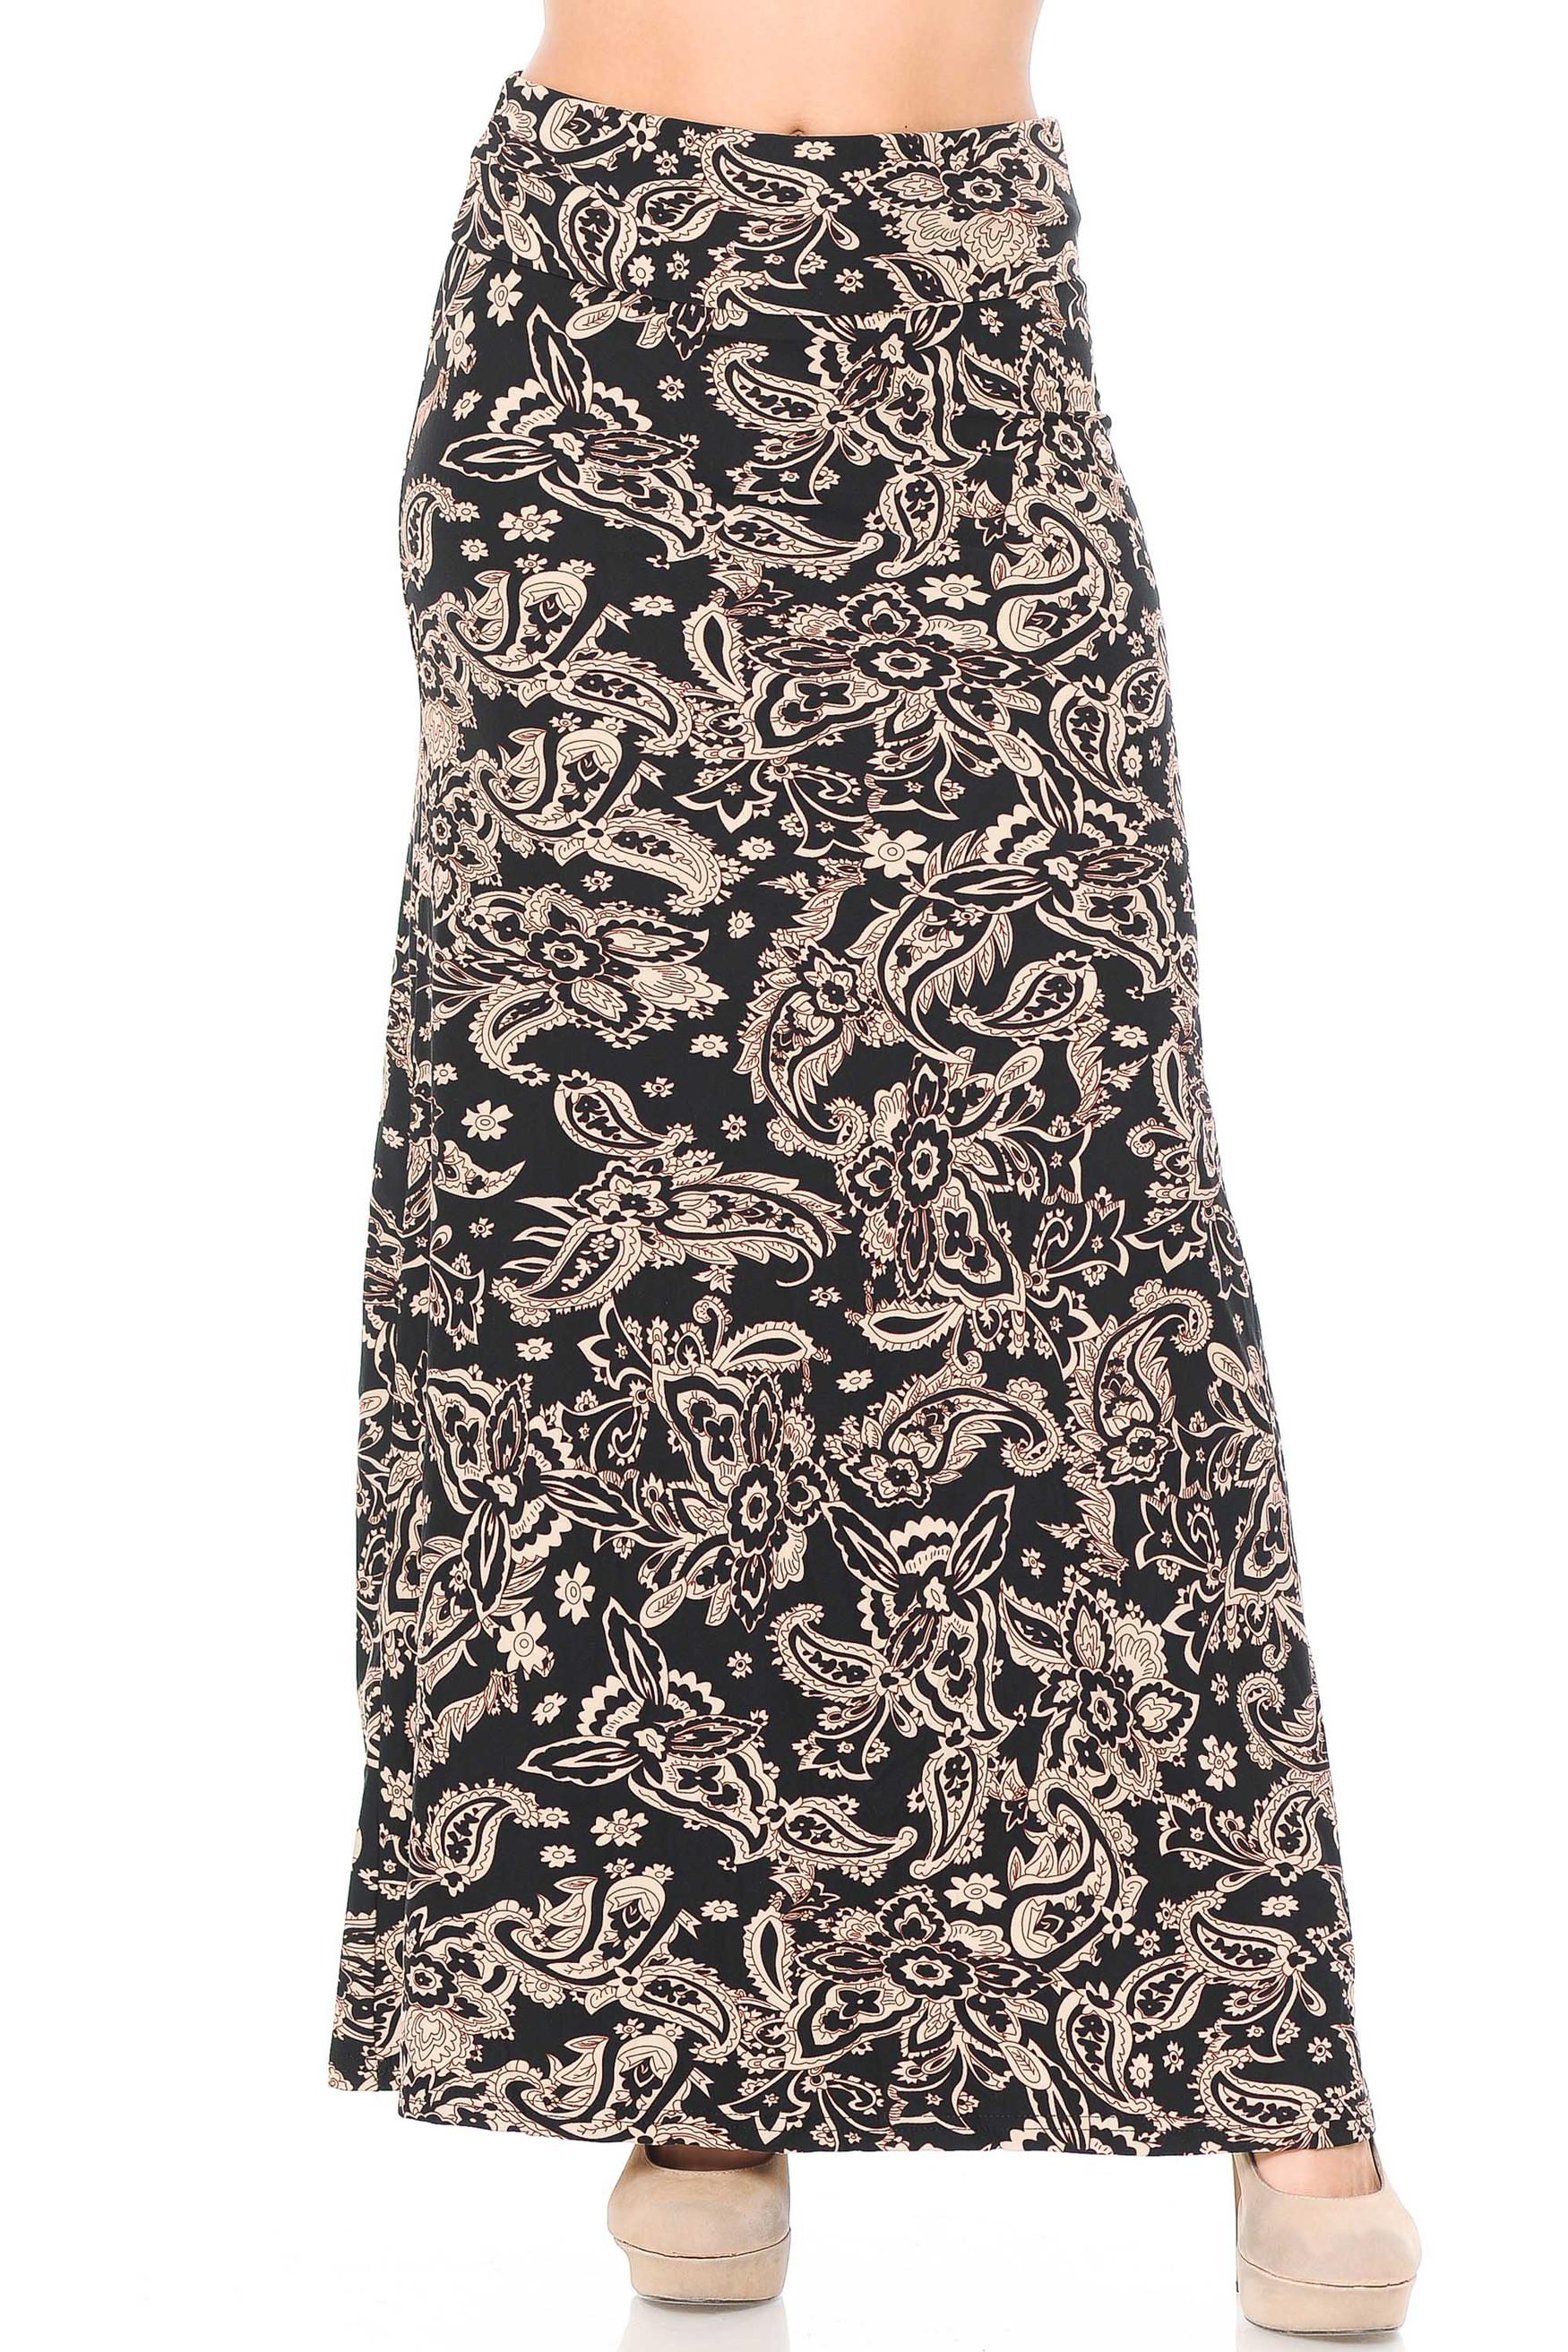 Brushed  Sand Pepper Paisley Maxi Skirt